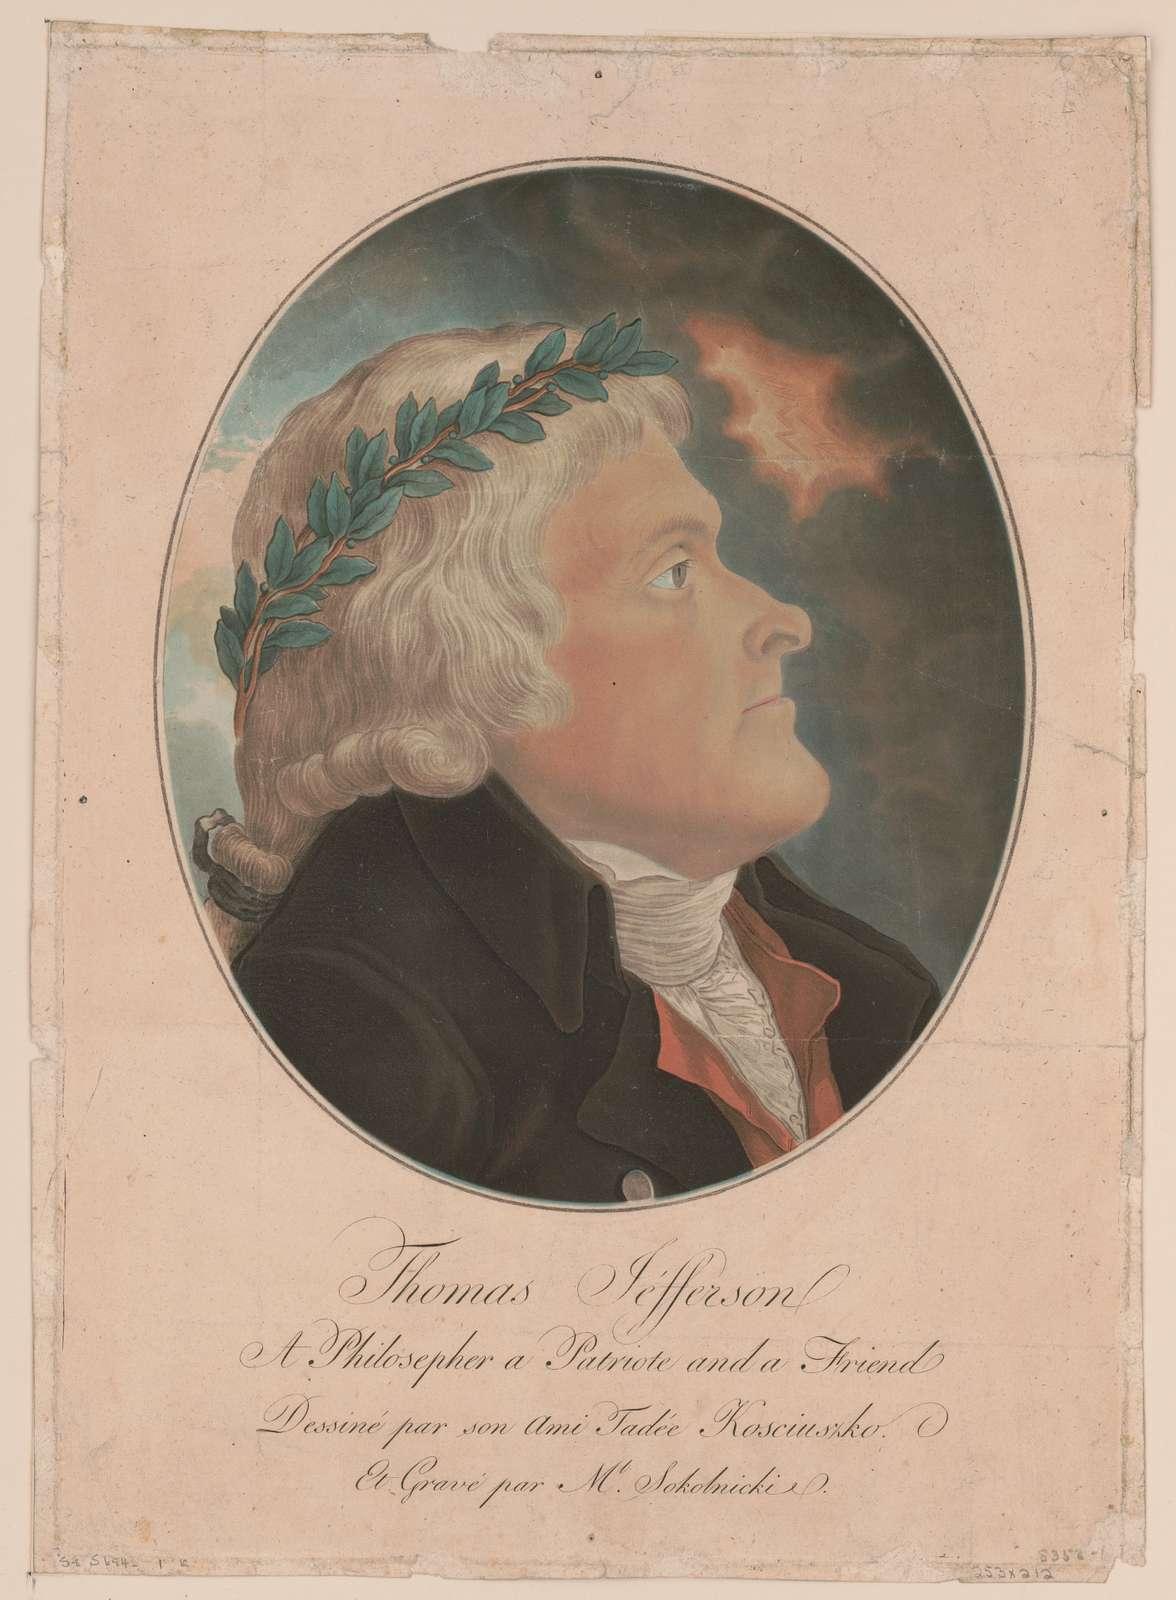 Thomas Jefferson, a philosopher, a patriote [sic], and a friend / dessiné par son ami Tadée Kosciuszko et gravé par Mł. Sokolnicki.